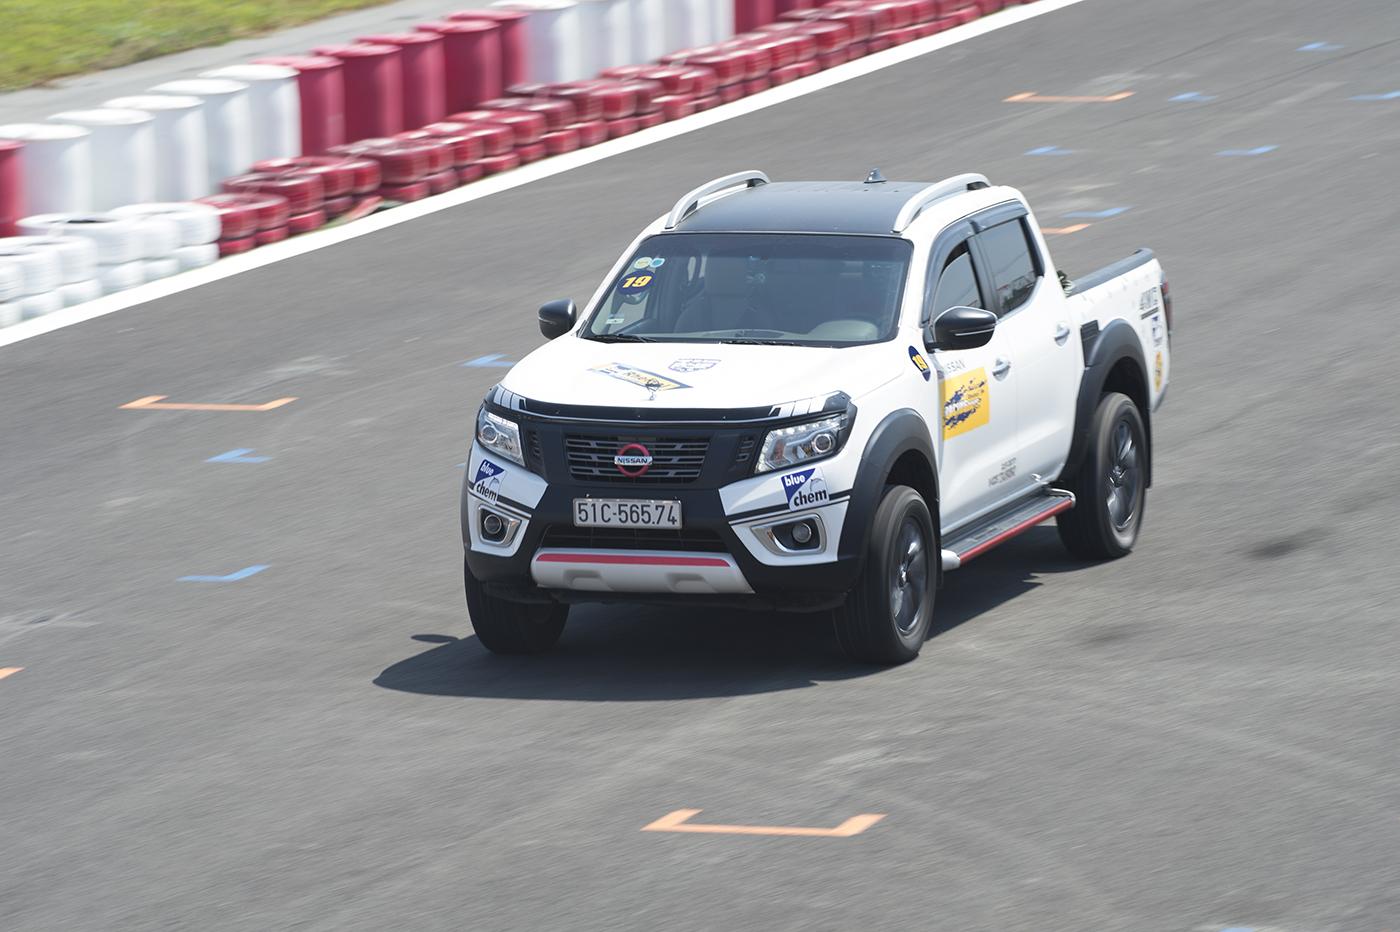 rheinol-racing-days-autodaily-0-18.jpg